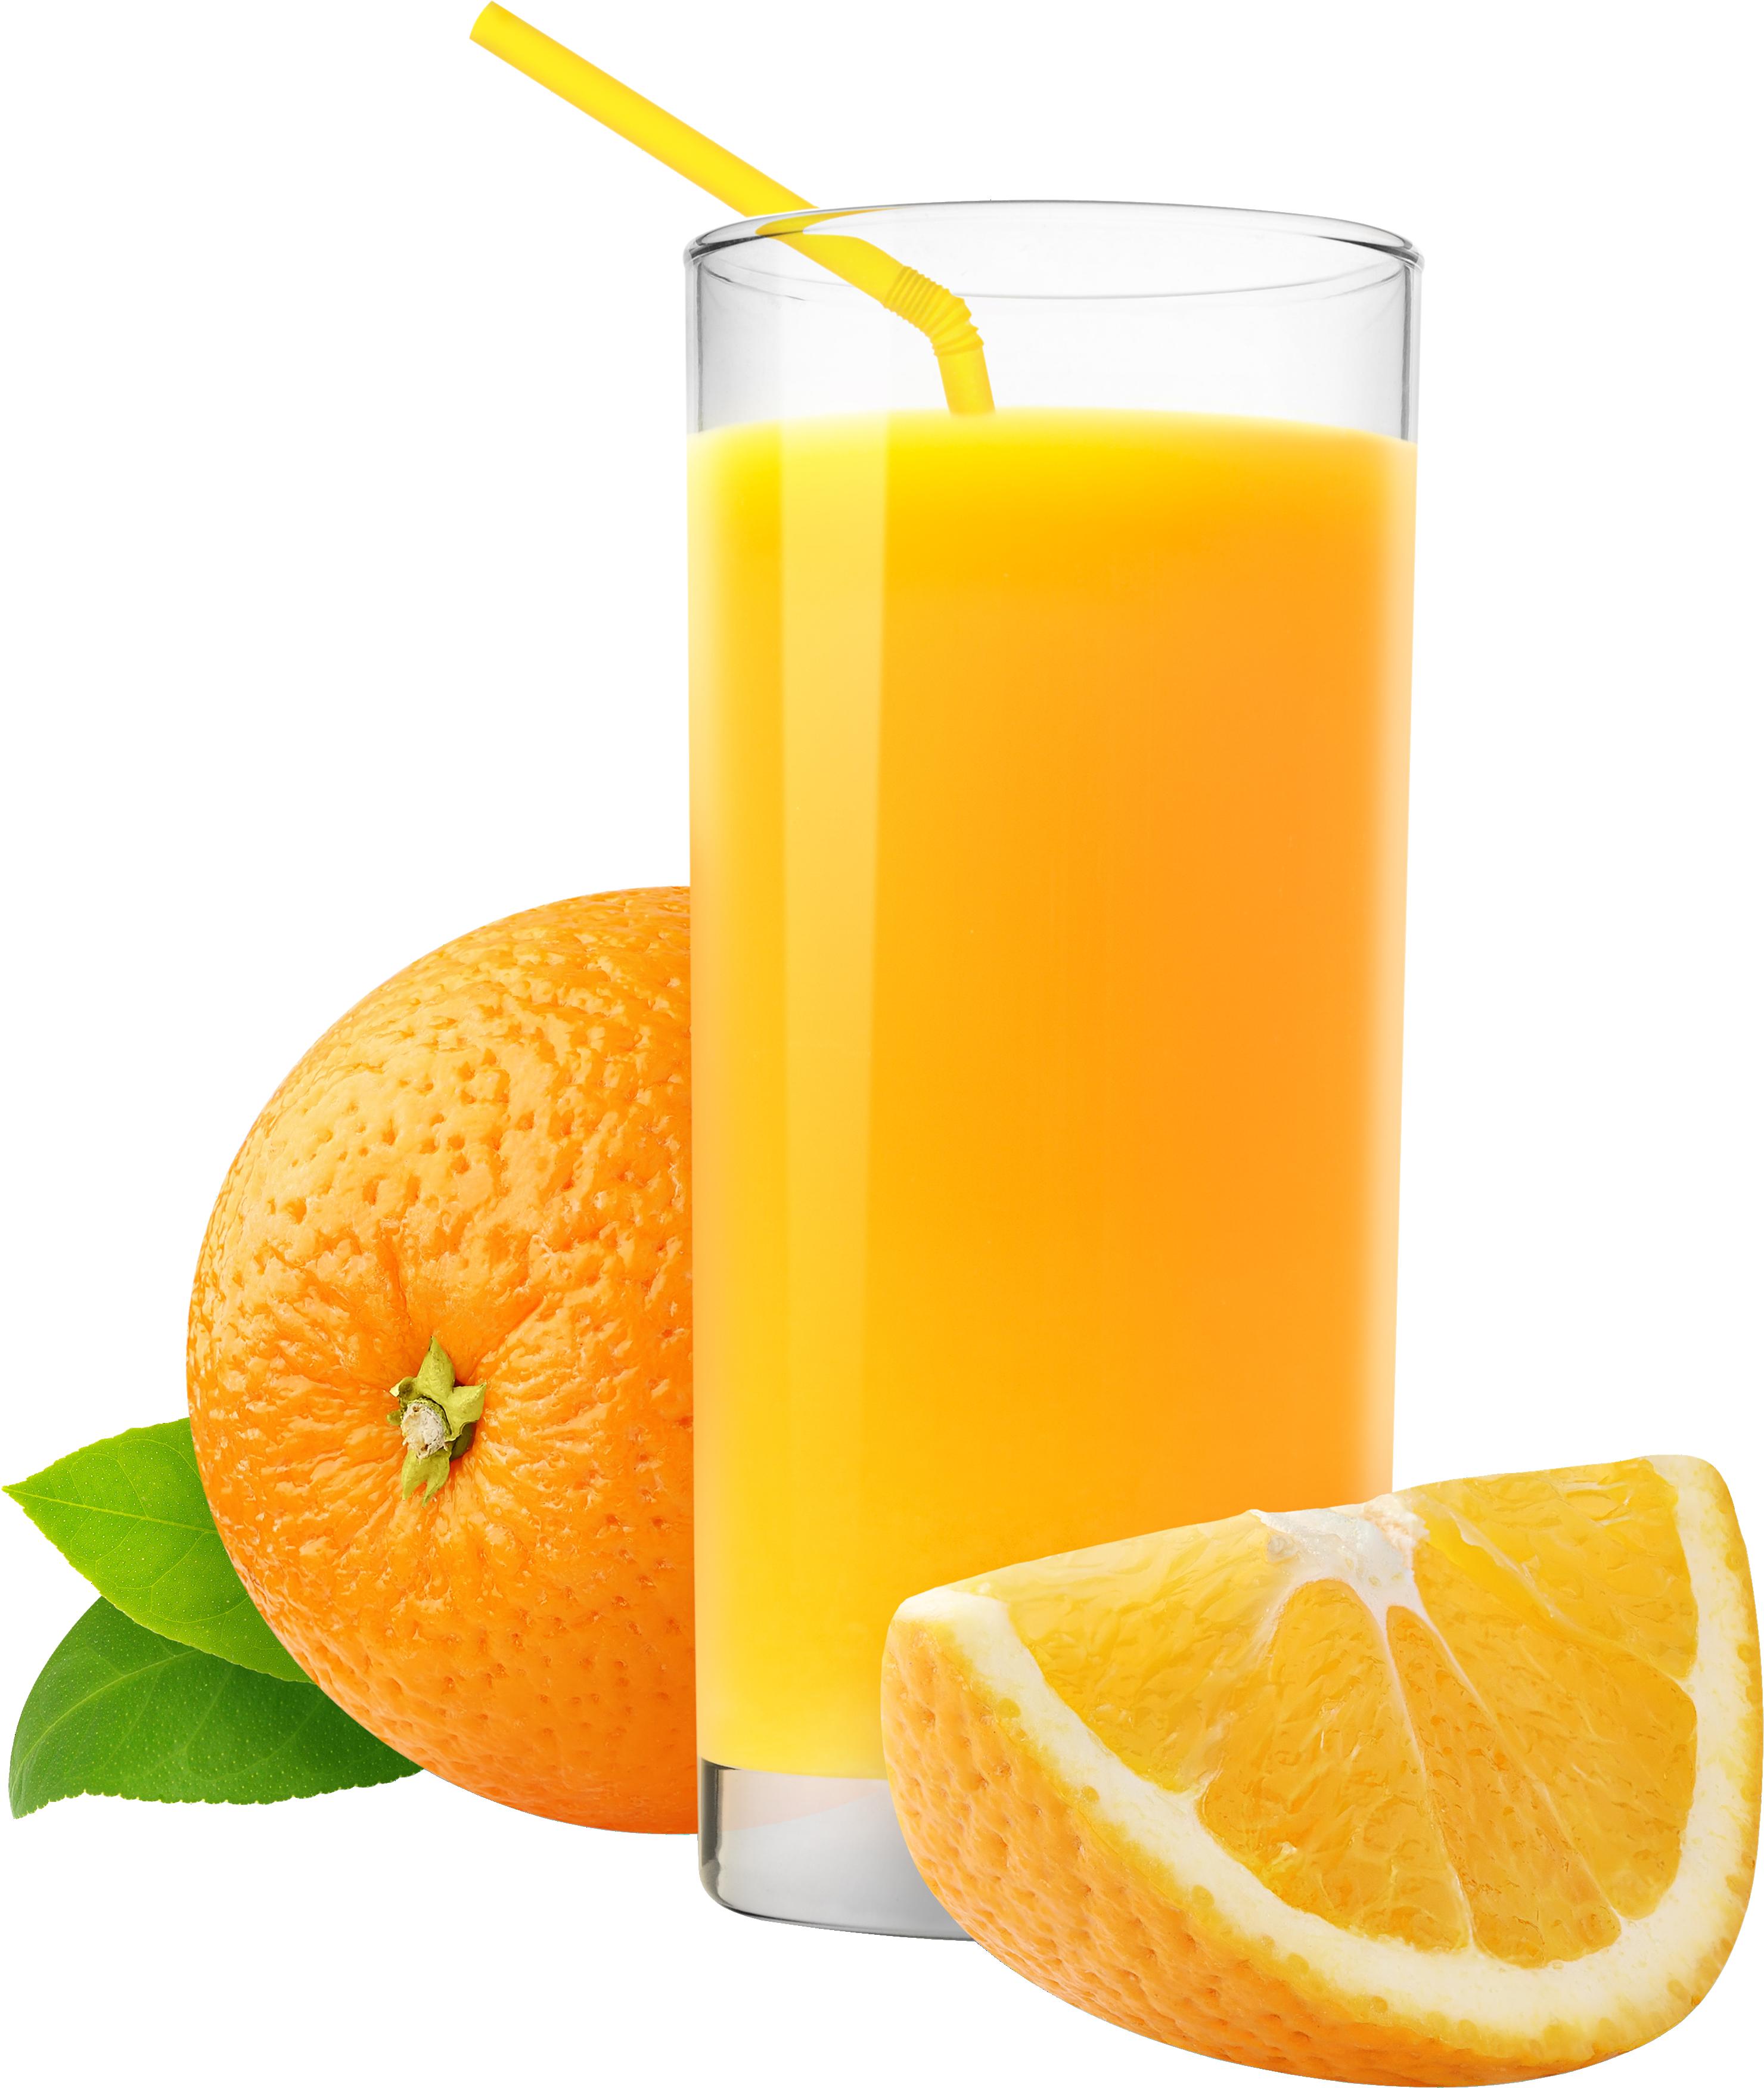 Orange Juice Png Image Orange Juice Png Image